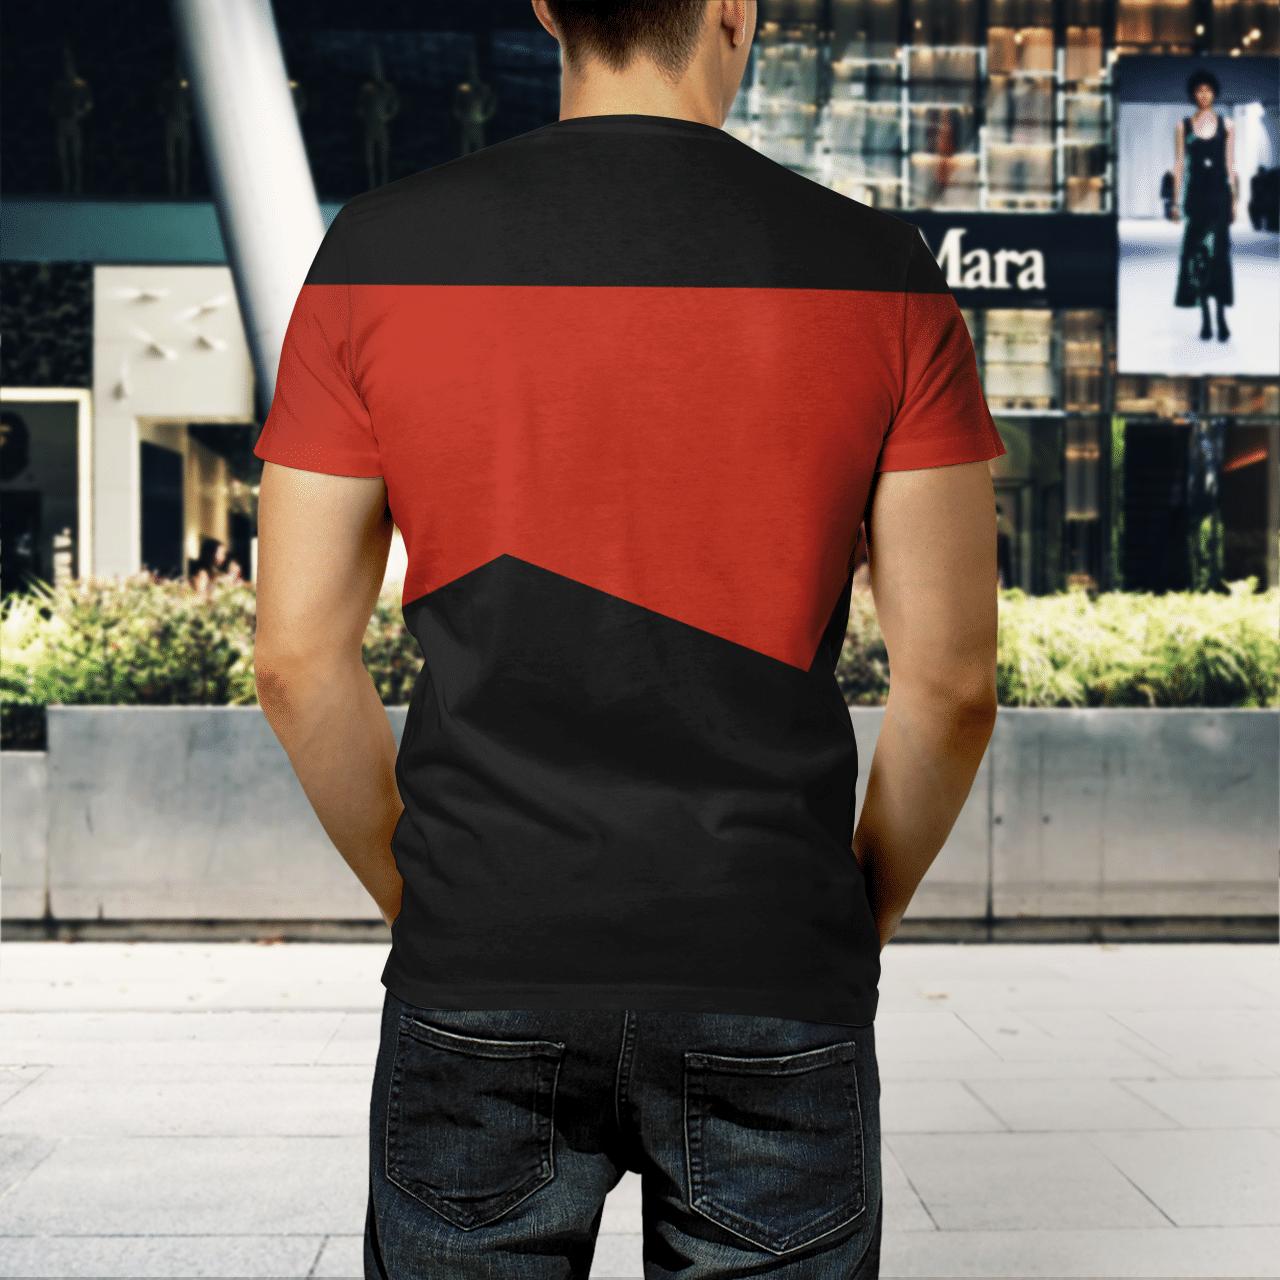 Star Trek captain 3d shirt 1.3